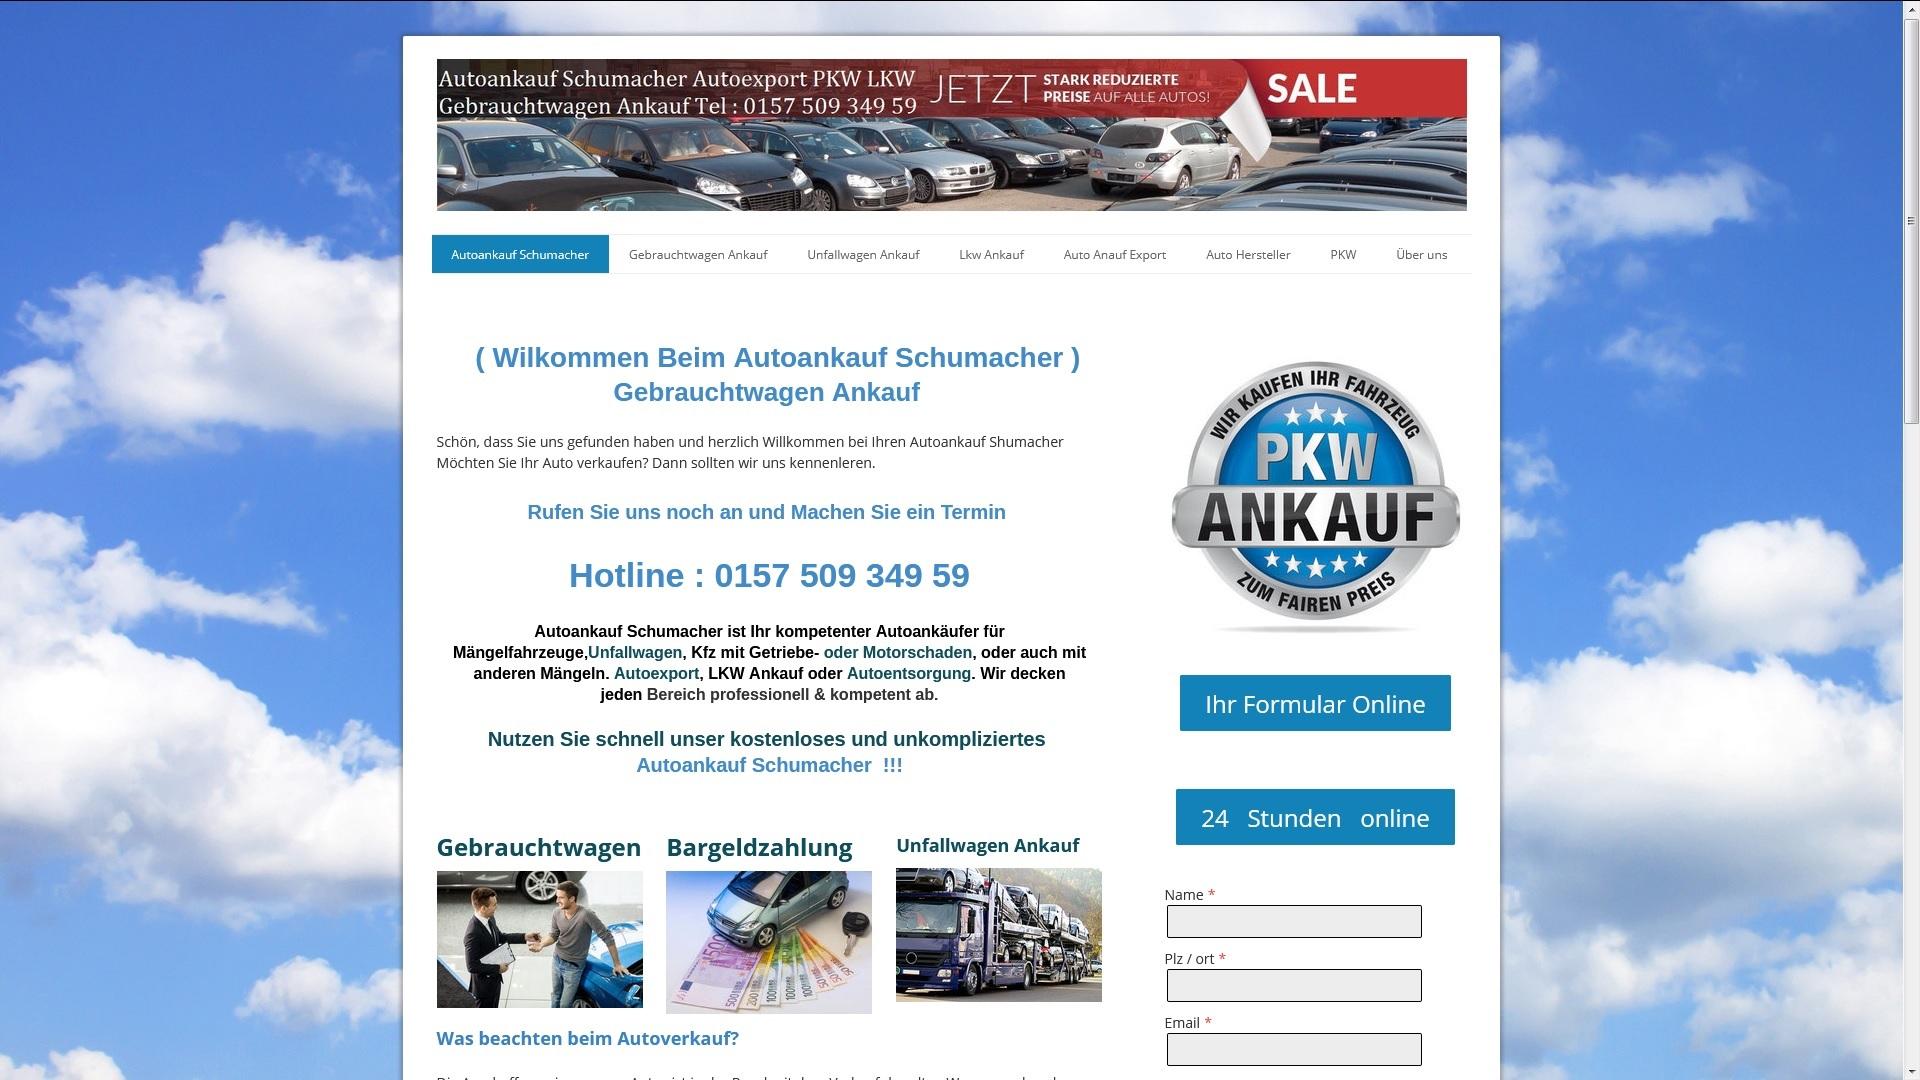 extra service bei autoankauf in friedrichshafen fuer ihr altes fahrzeug - Extra Service bei Autoankauf in Friedrichshafen für ihr altes Fahrzeug